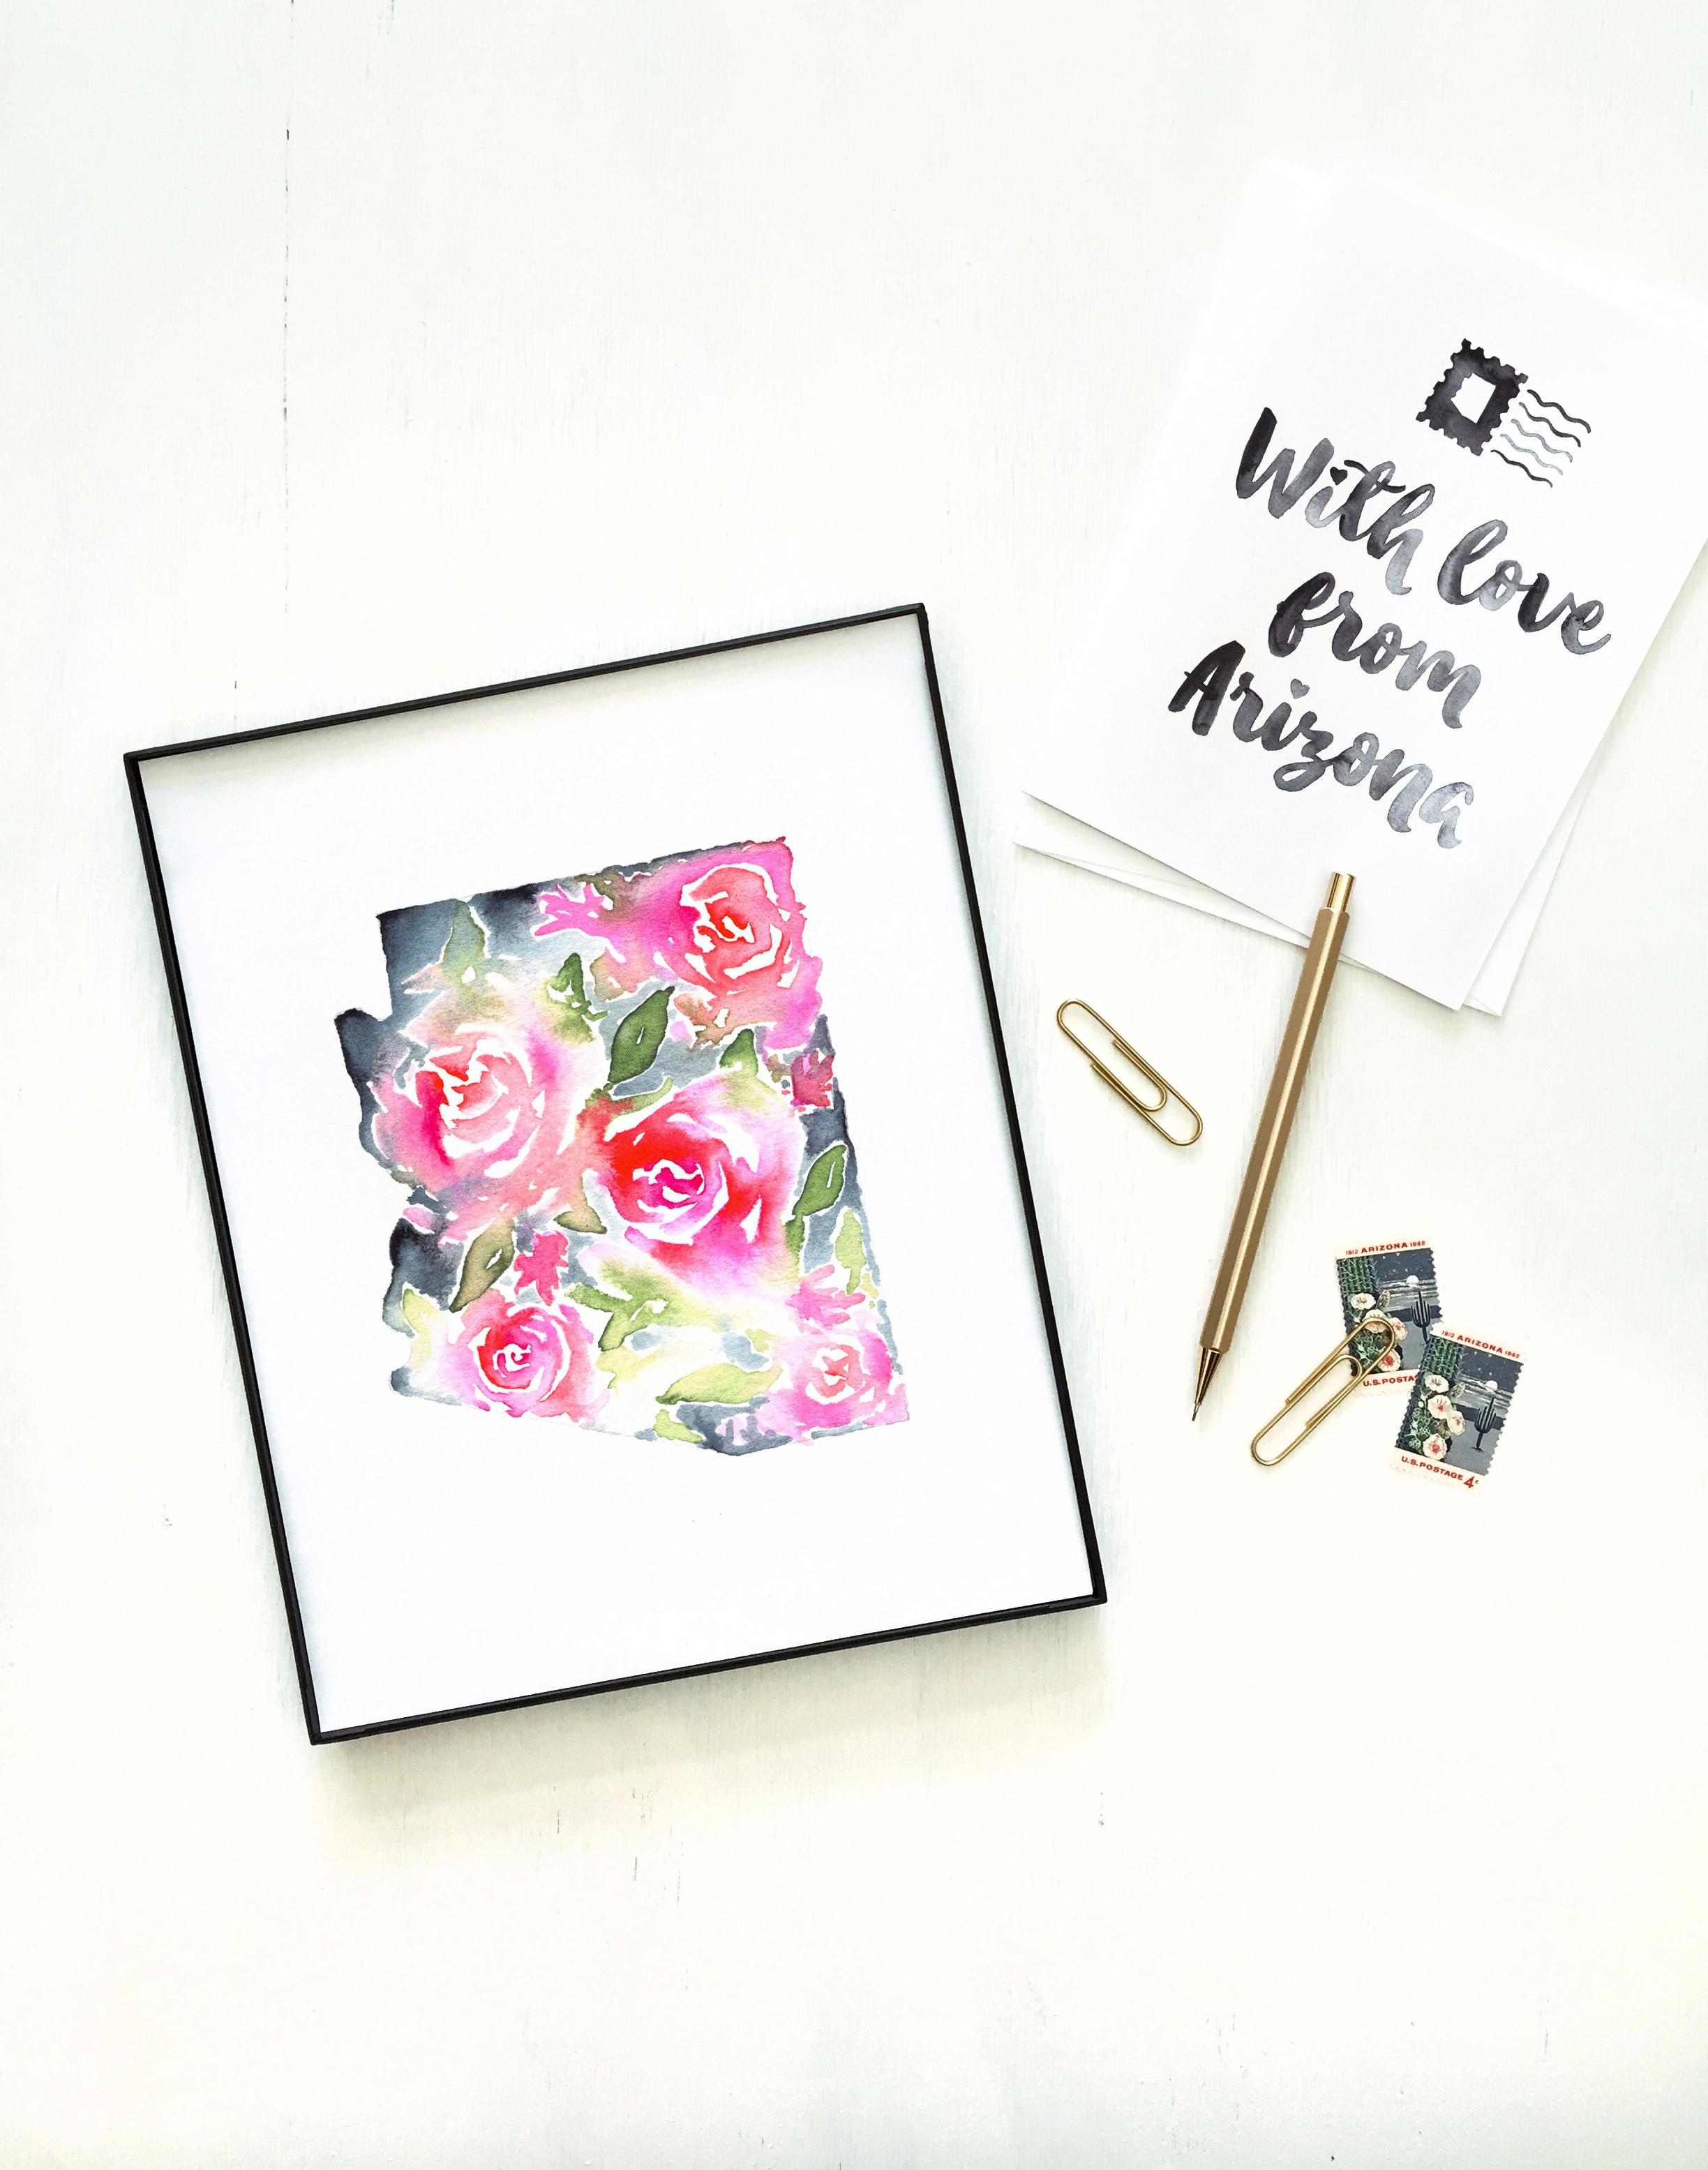 phx-supply-co-art-print-watercolor-az-soft-roses.jpg